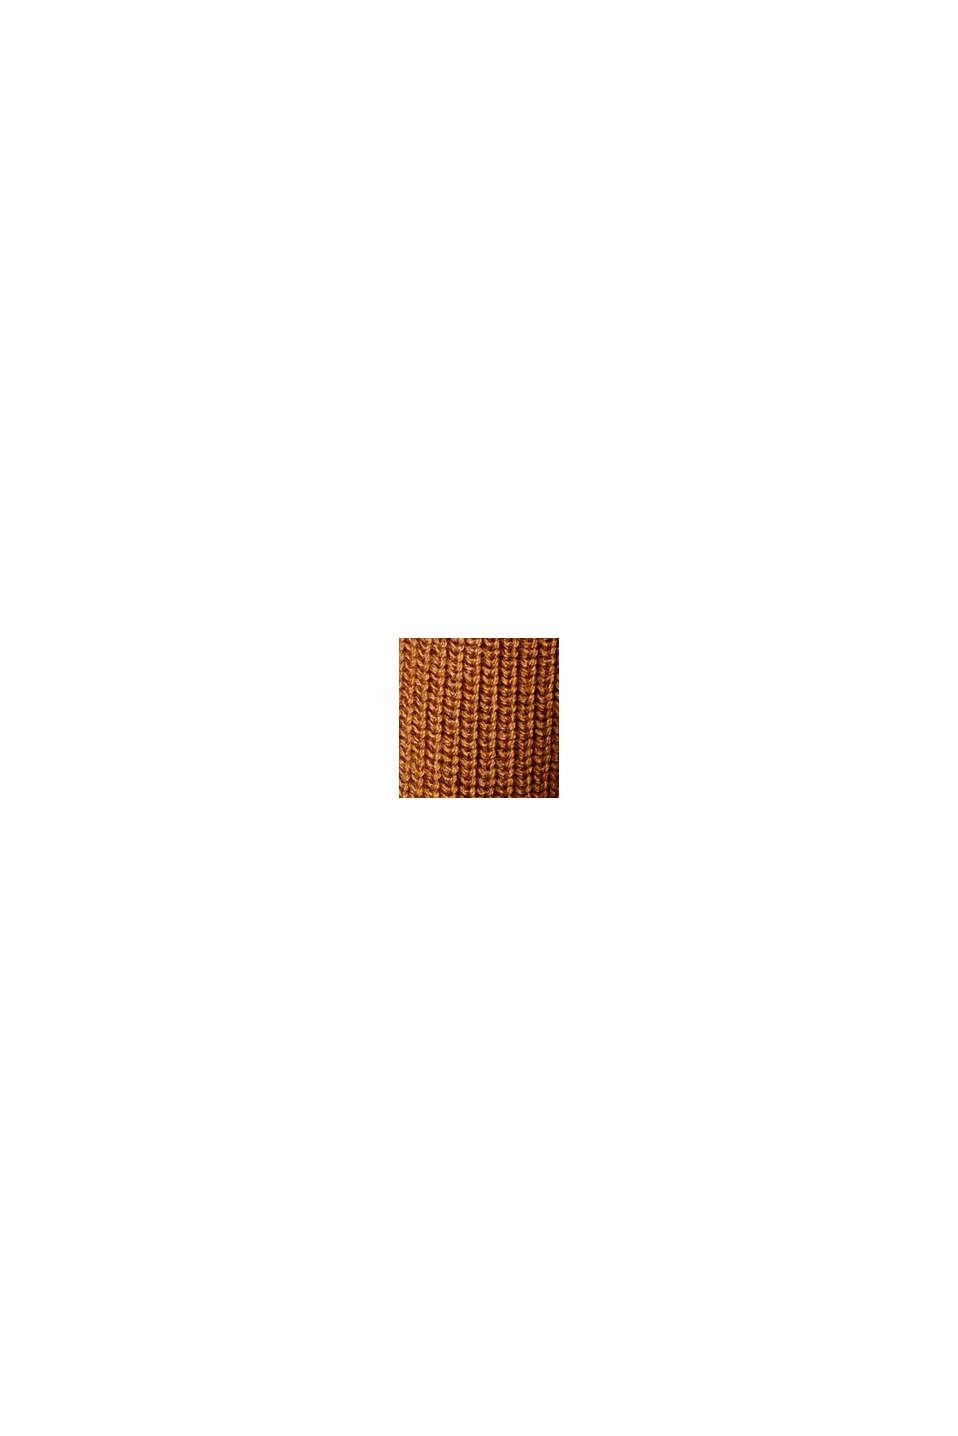 Pullover dolcevita in 100% cotone biologico, CAMEL, swatch